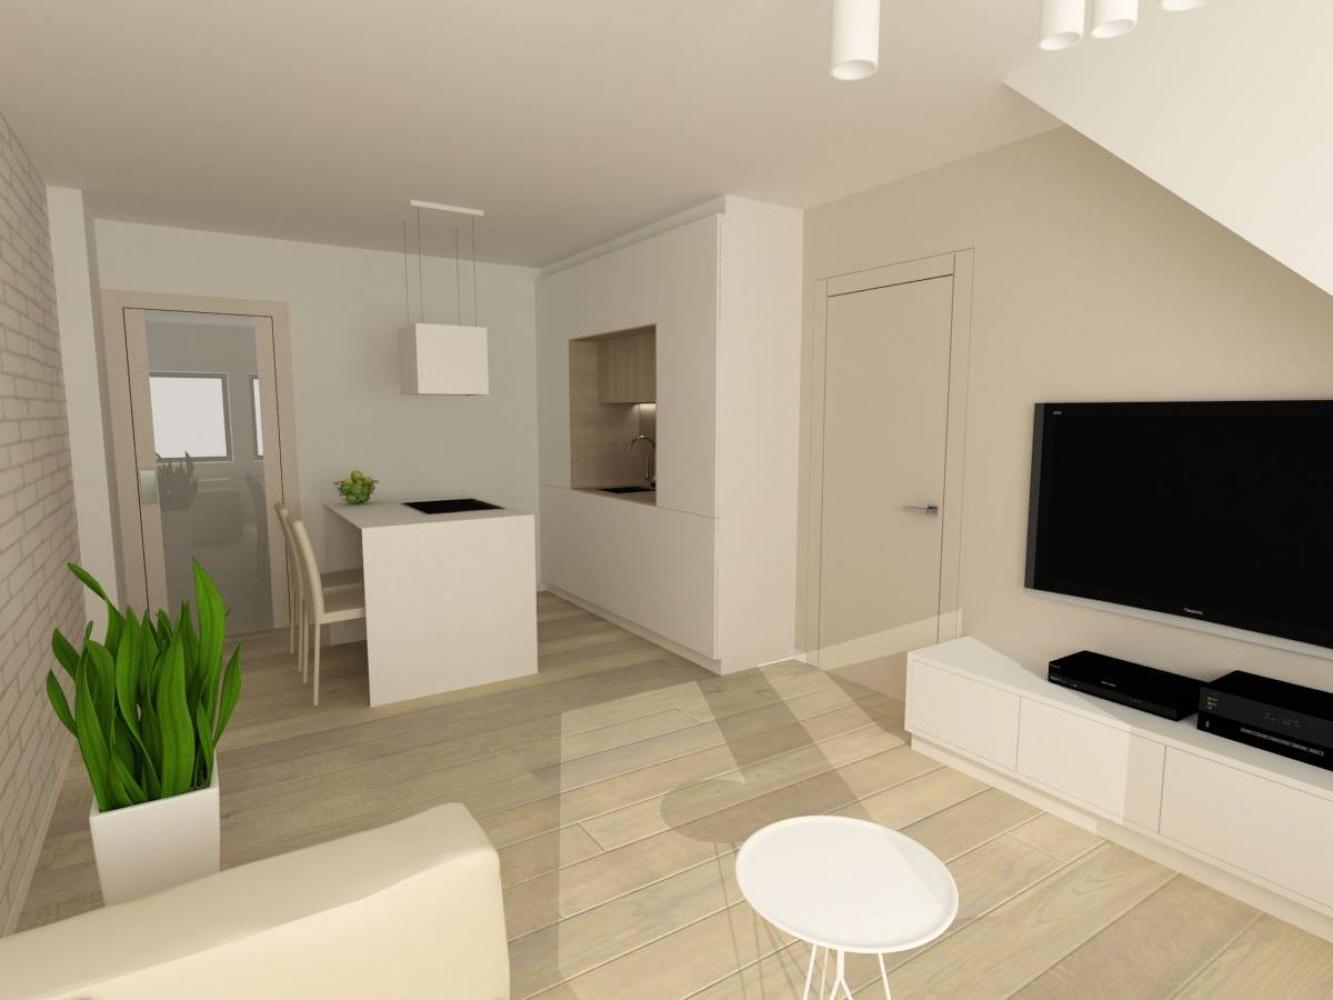 Půdní byt 2+kk, plocha 45 m², ulice Svatoslavova, Praha 4 - Nusle | 2